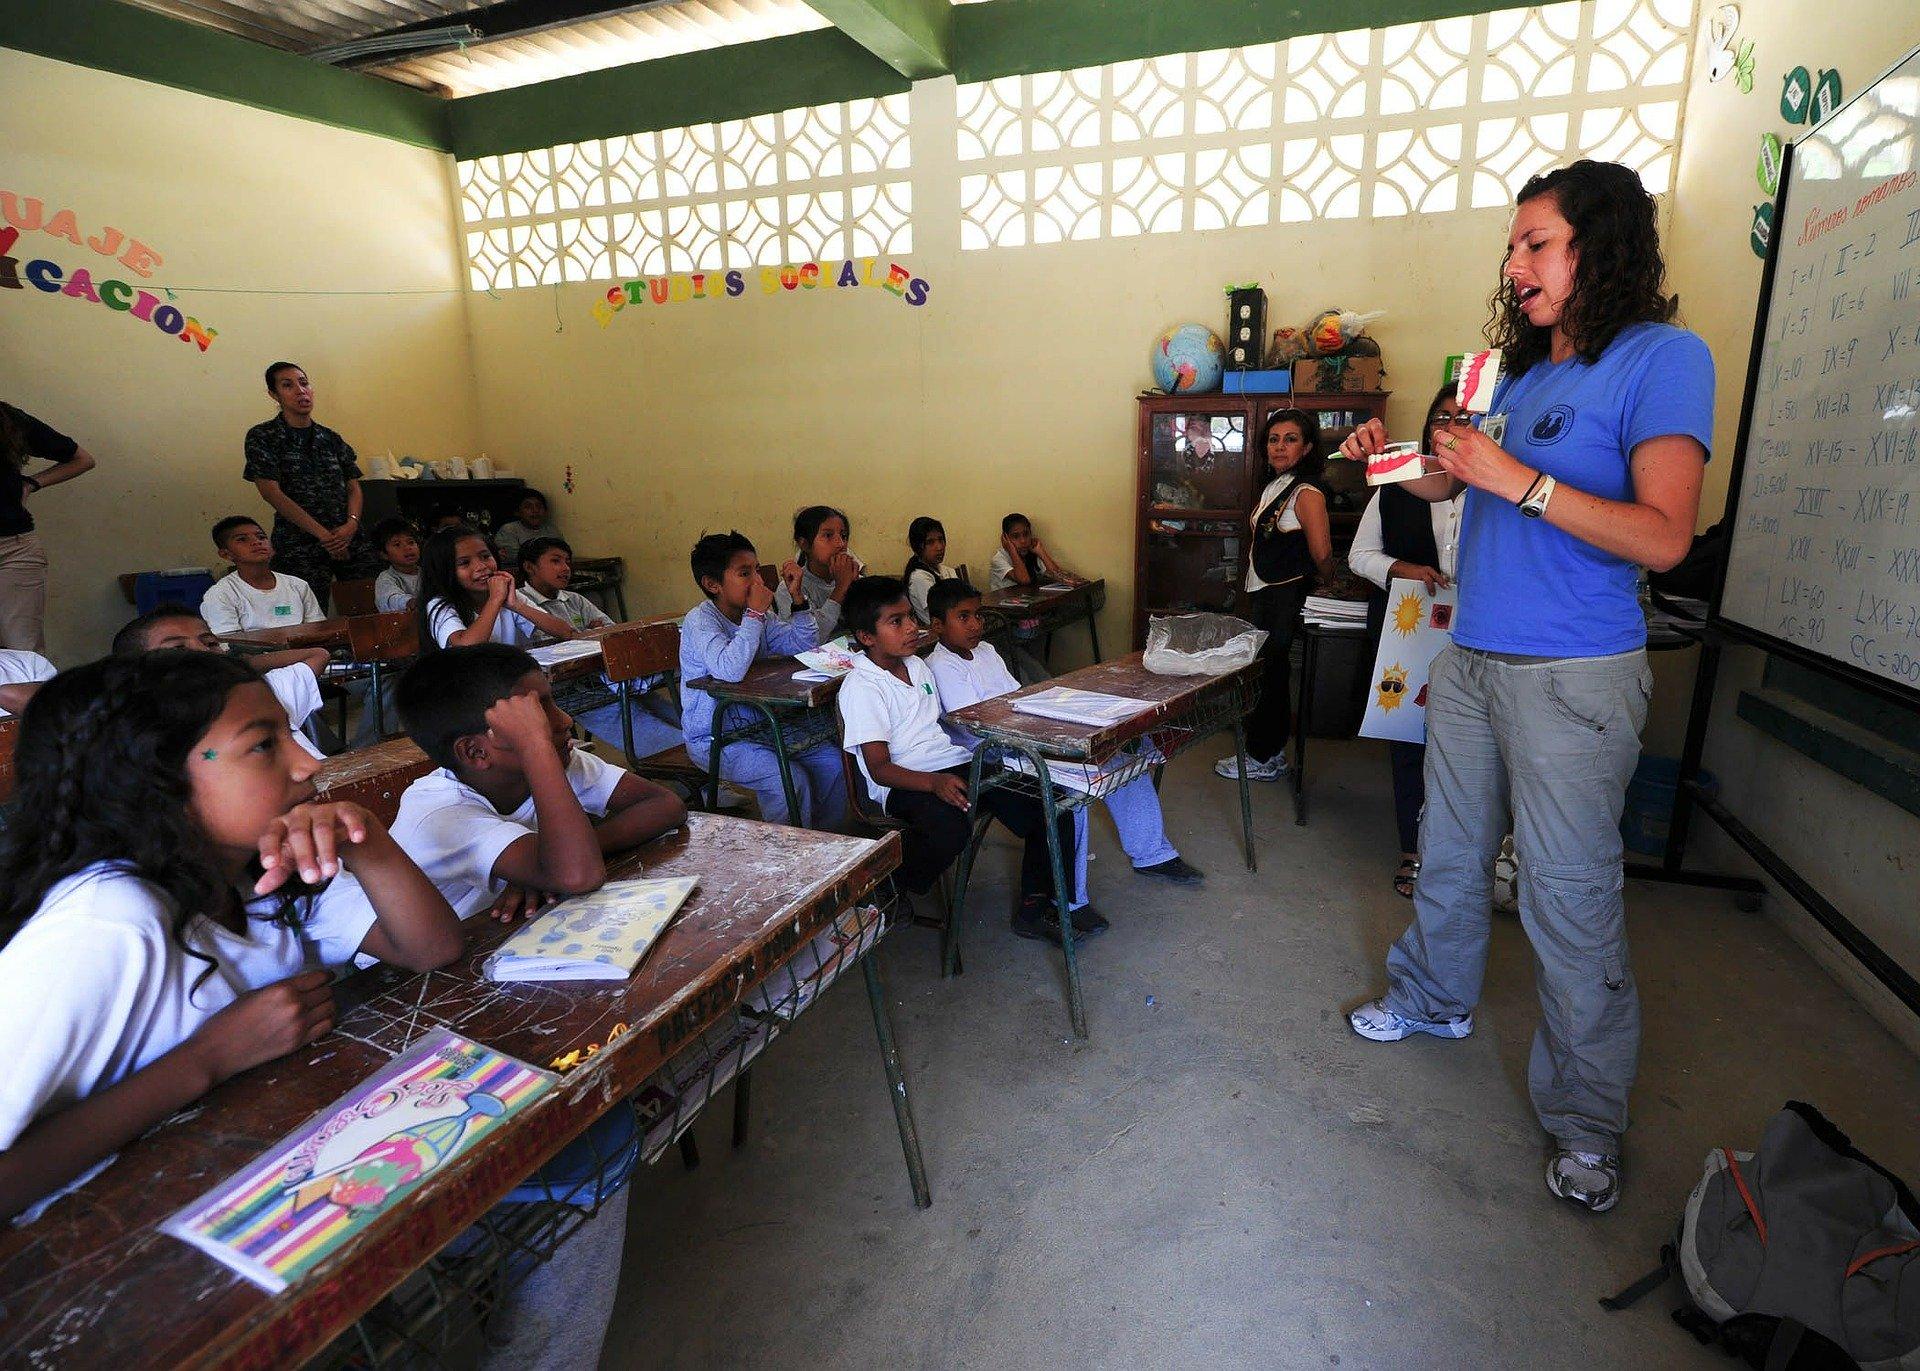 ESL teaching classroom